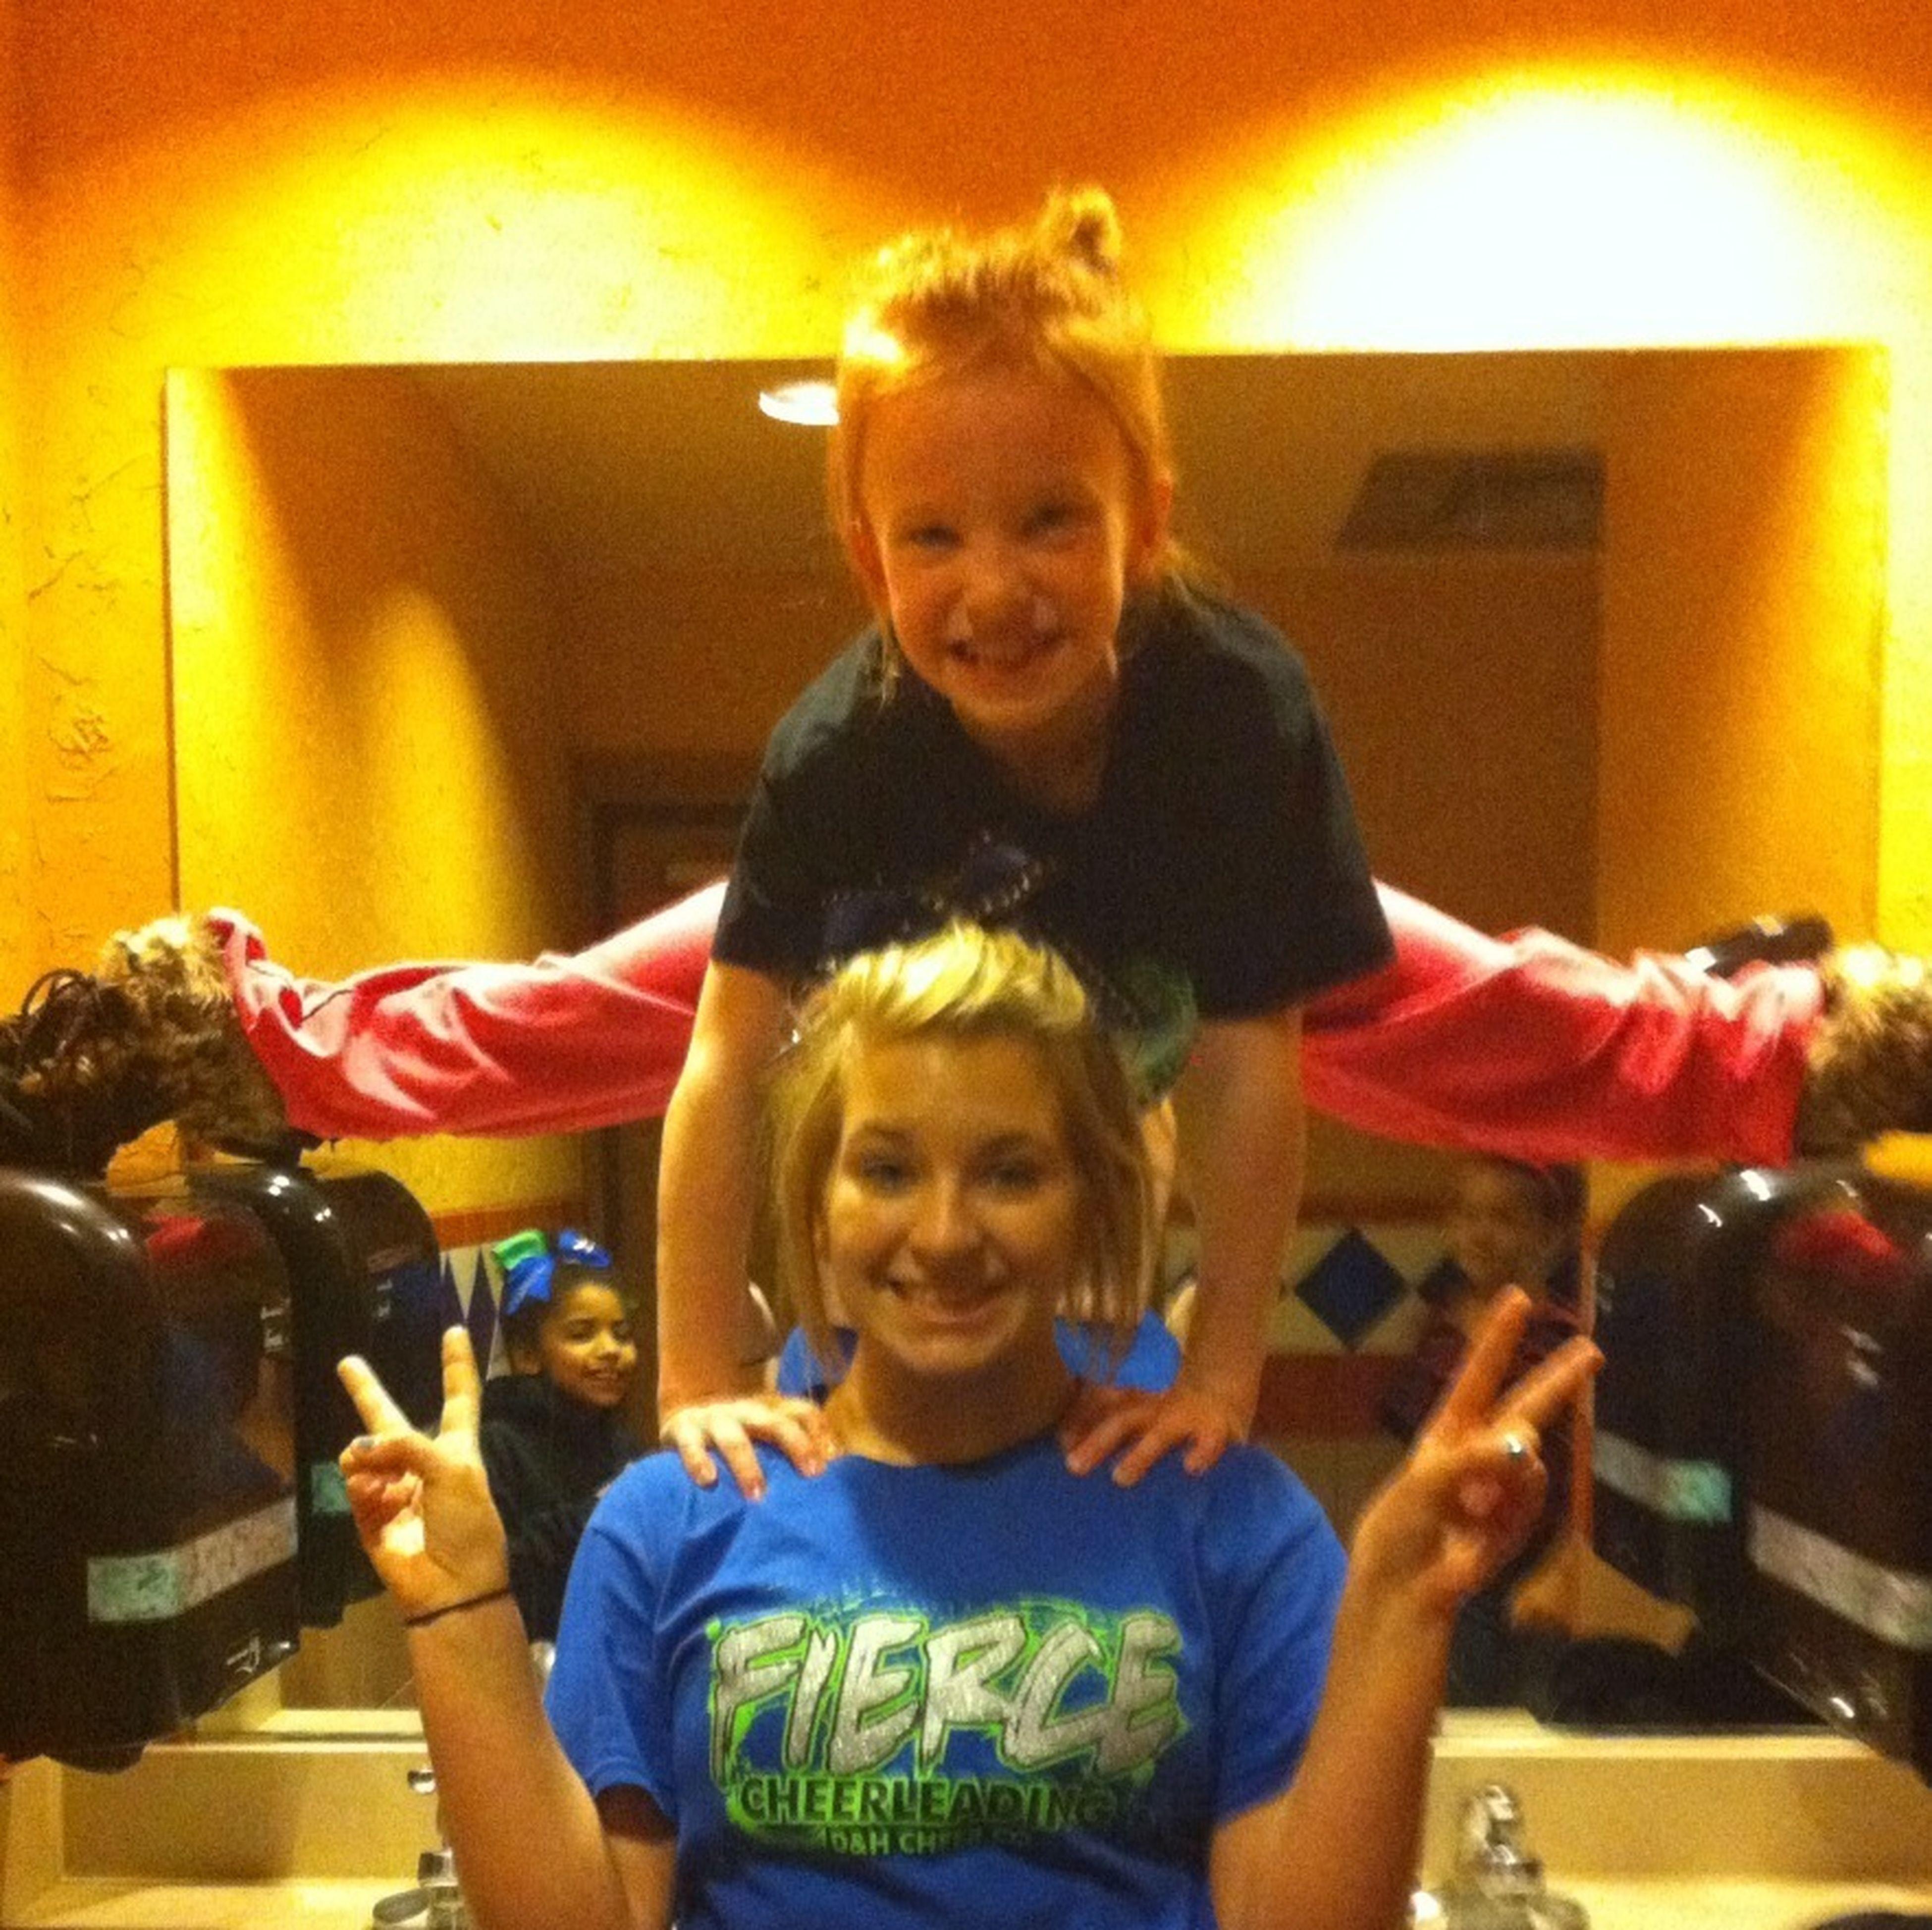 Cheerleader Mess